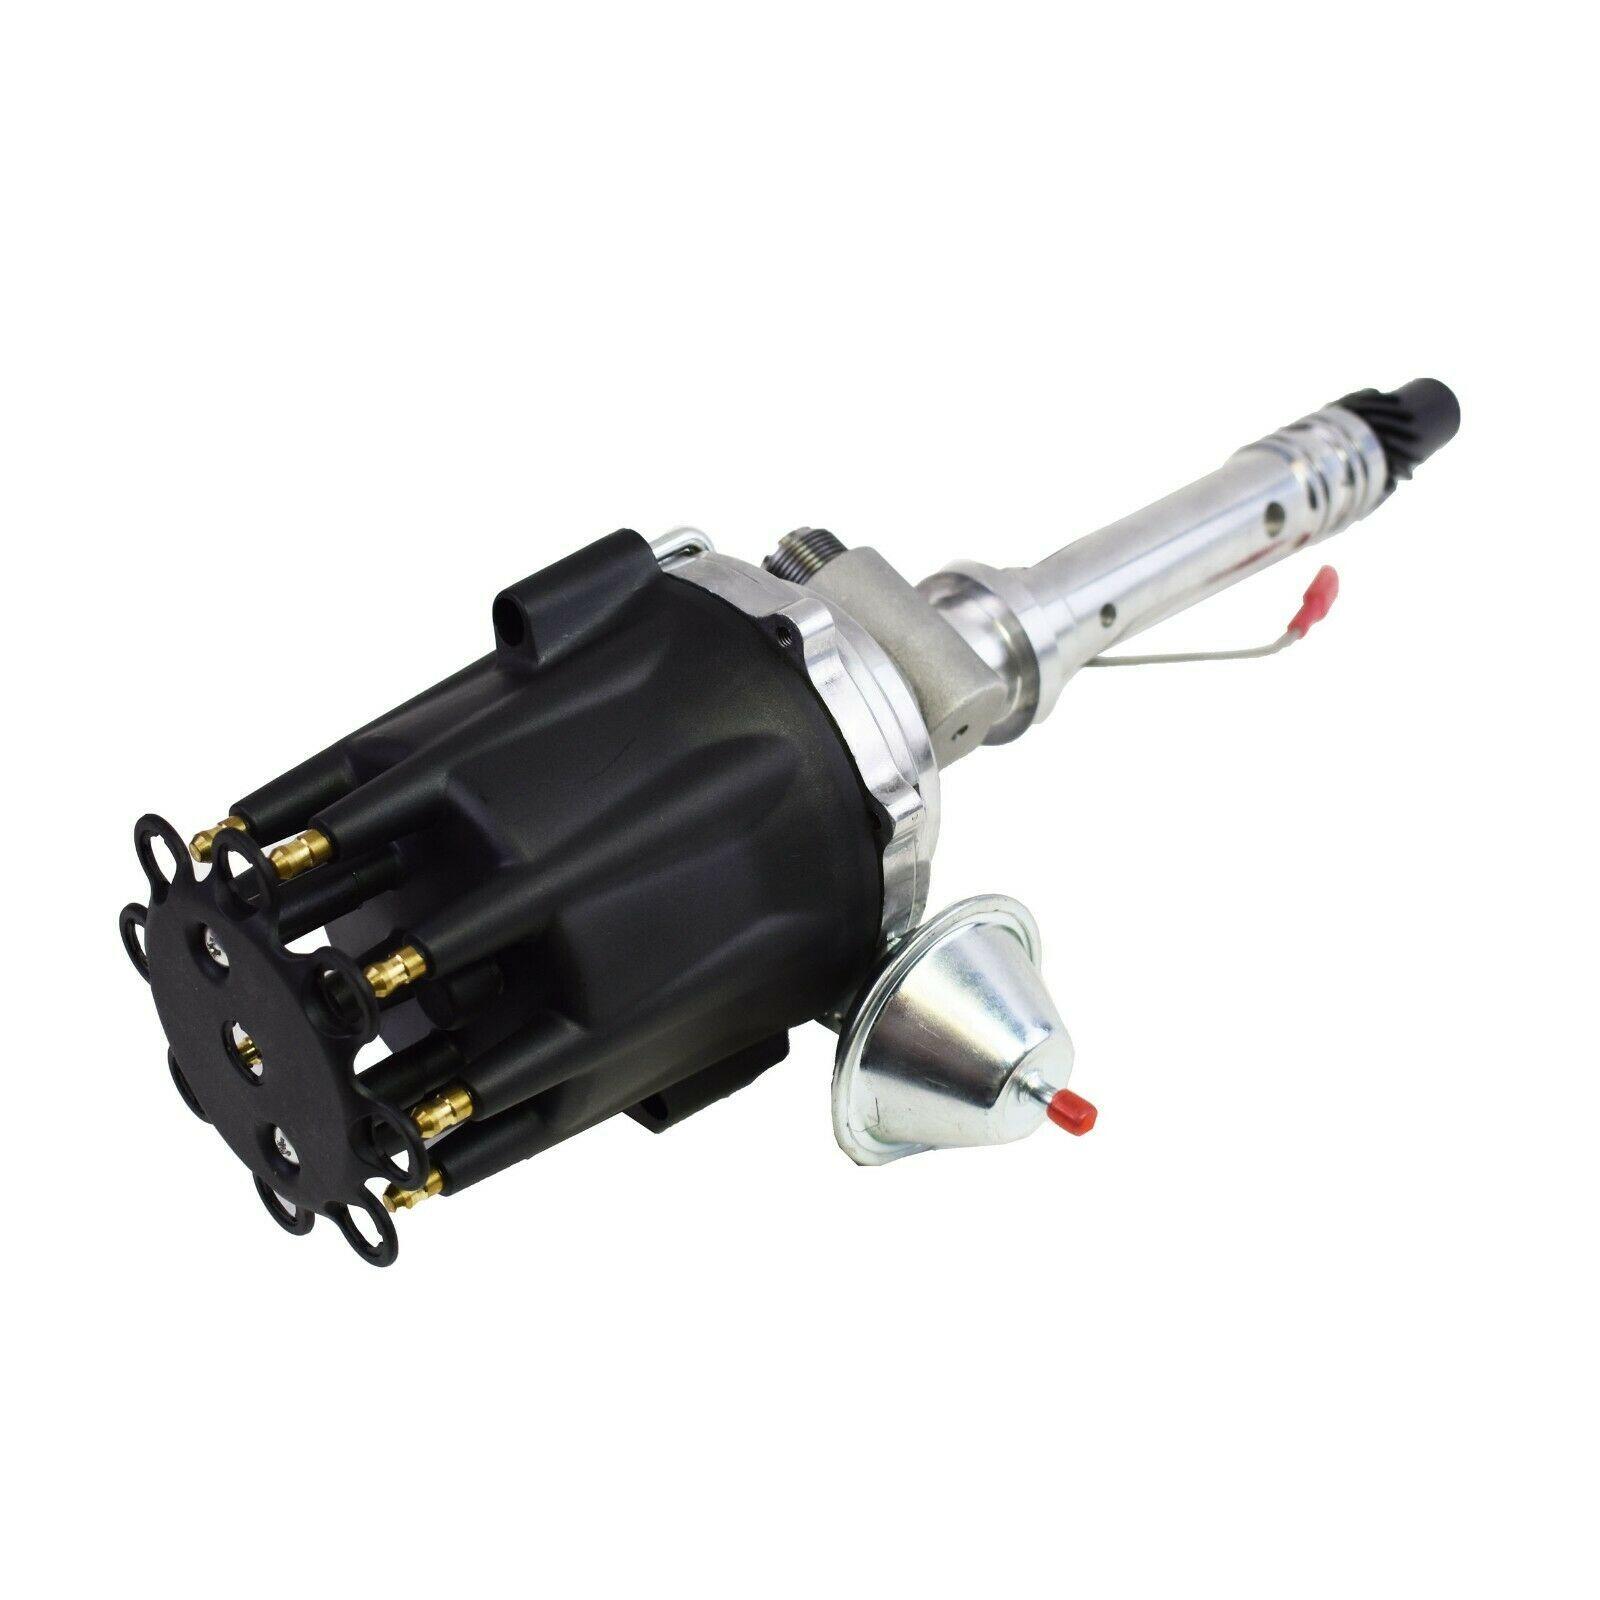 Pro Series R2R Tach Drive Distributor Corvette SBC BBC 327 350 396 427 454 Black